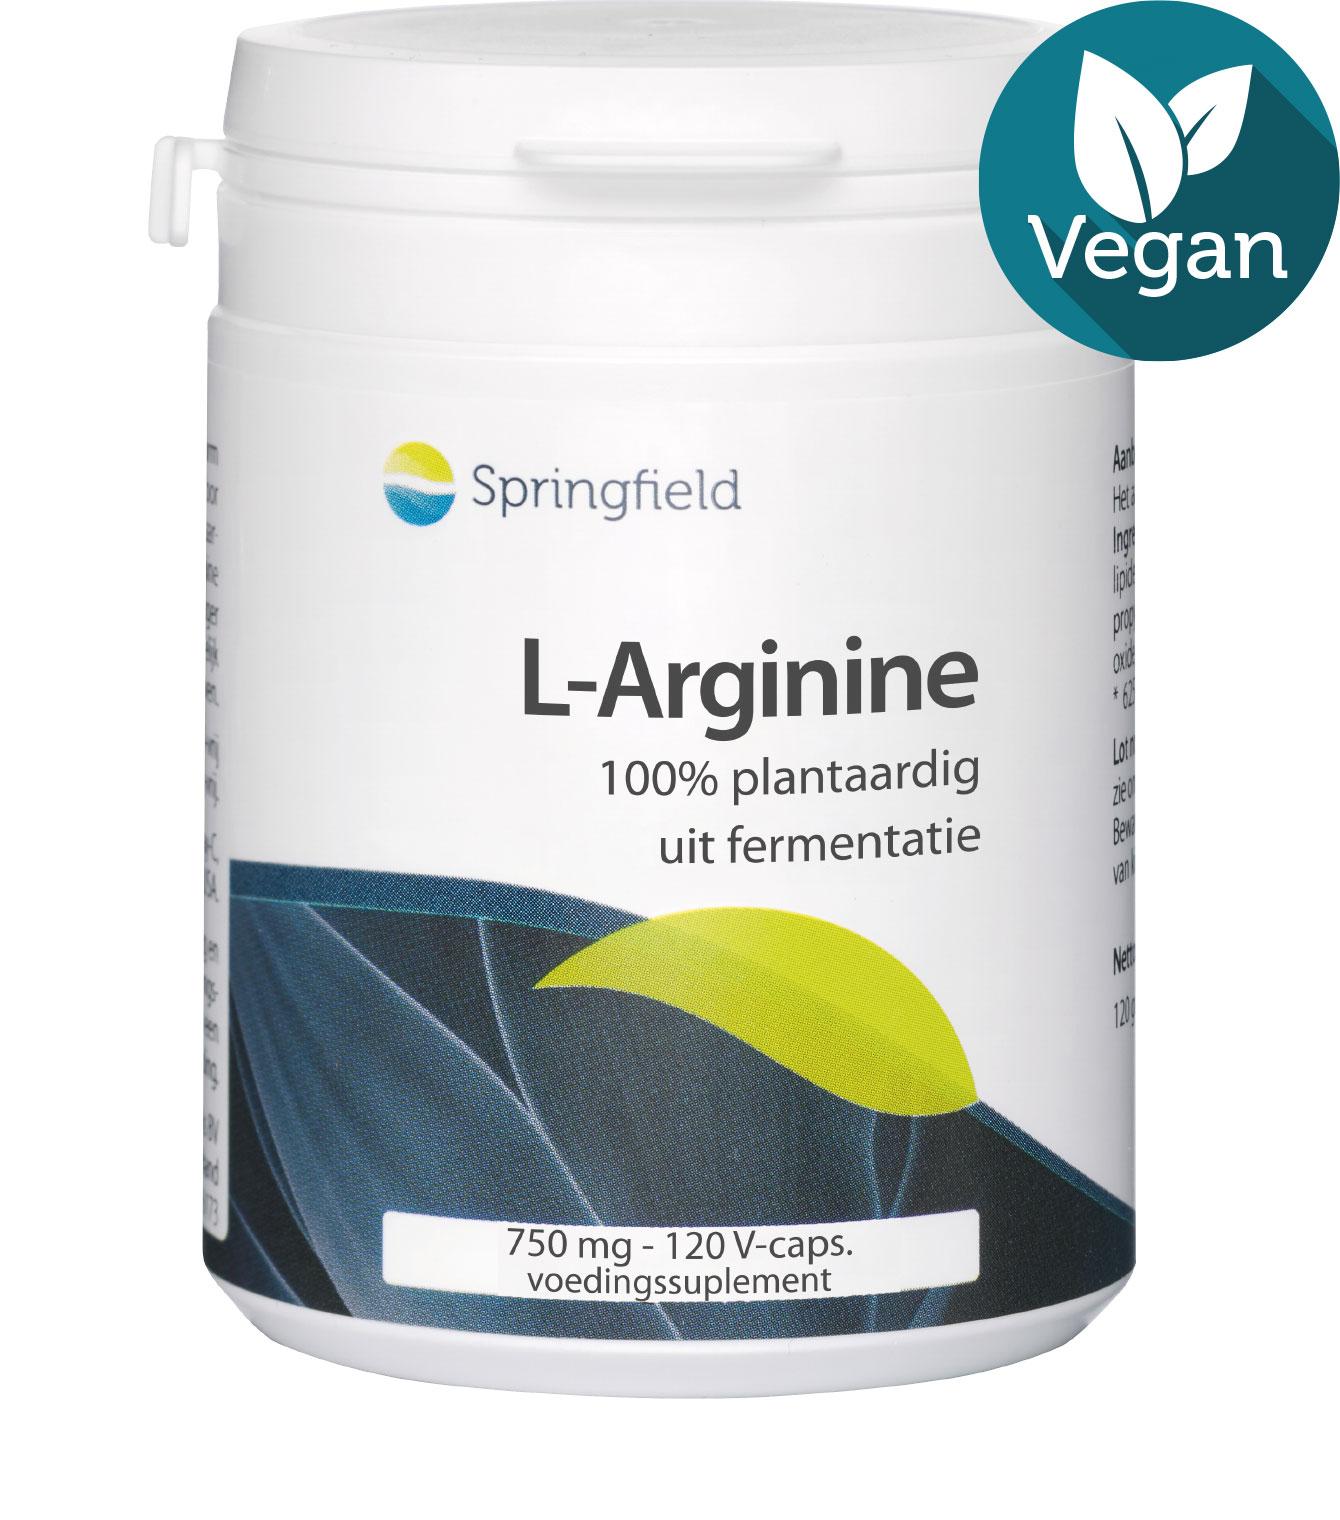 L-Arginine - 750 mg uit fermentatie - 100% plantaardig - vegan